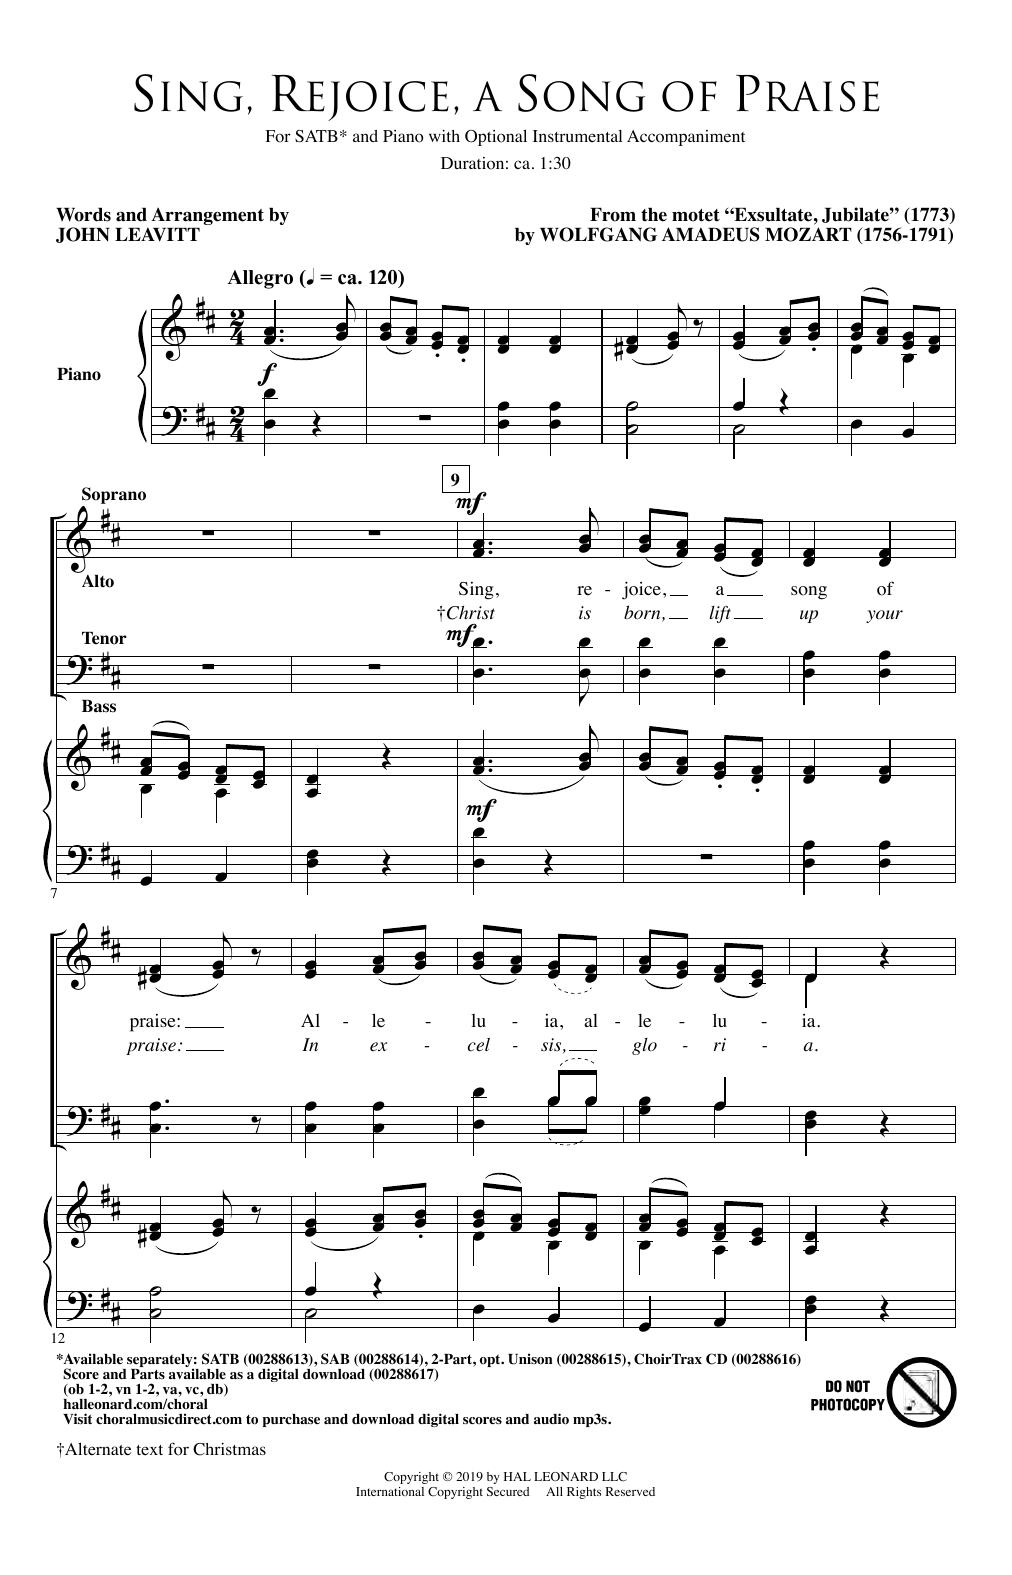 Sing, Rejoice A Song Of Praise (arr. John Leavitt) (SATB Choir)